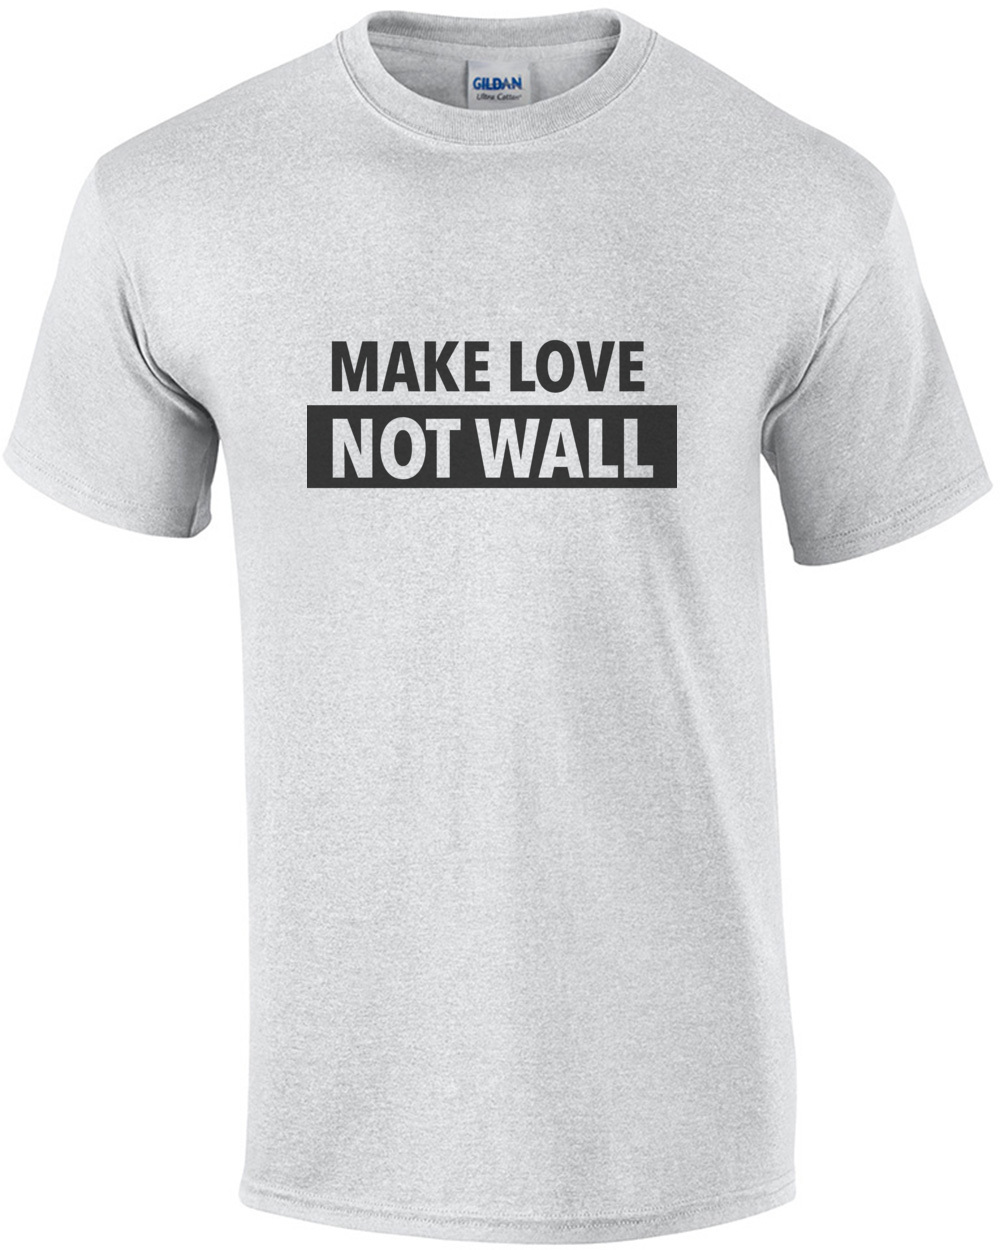 7096ed03 Make Love Not Wall Anti Trump T Shirt Democrat T Shirt